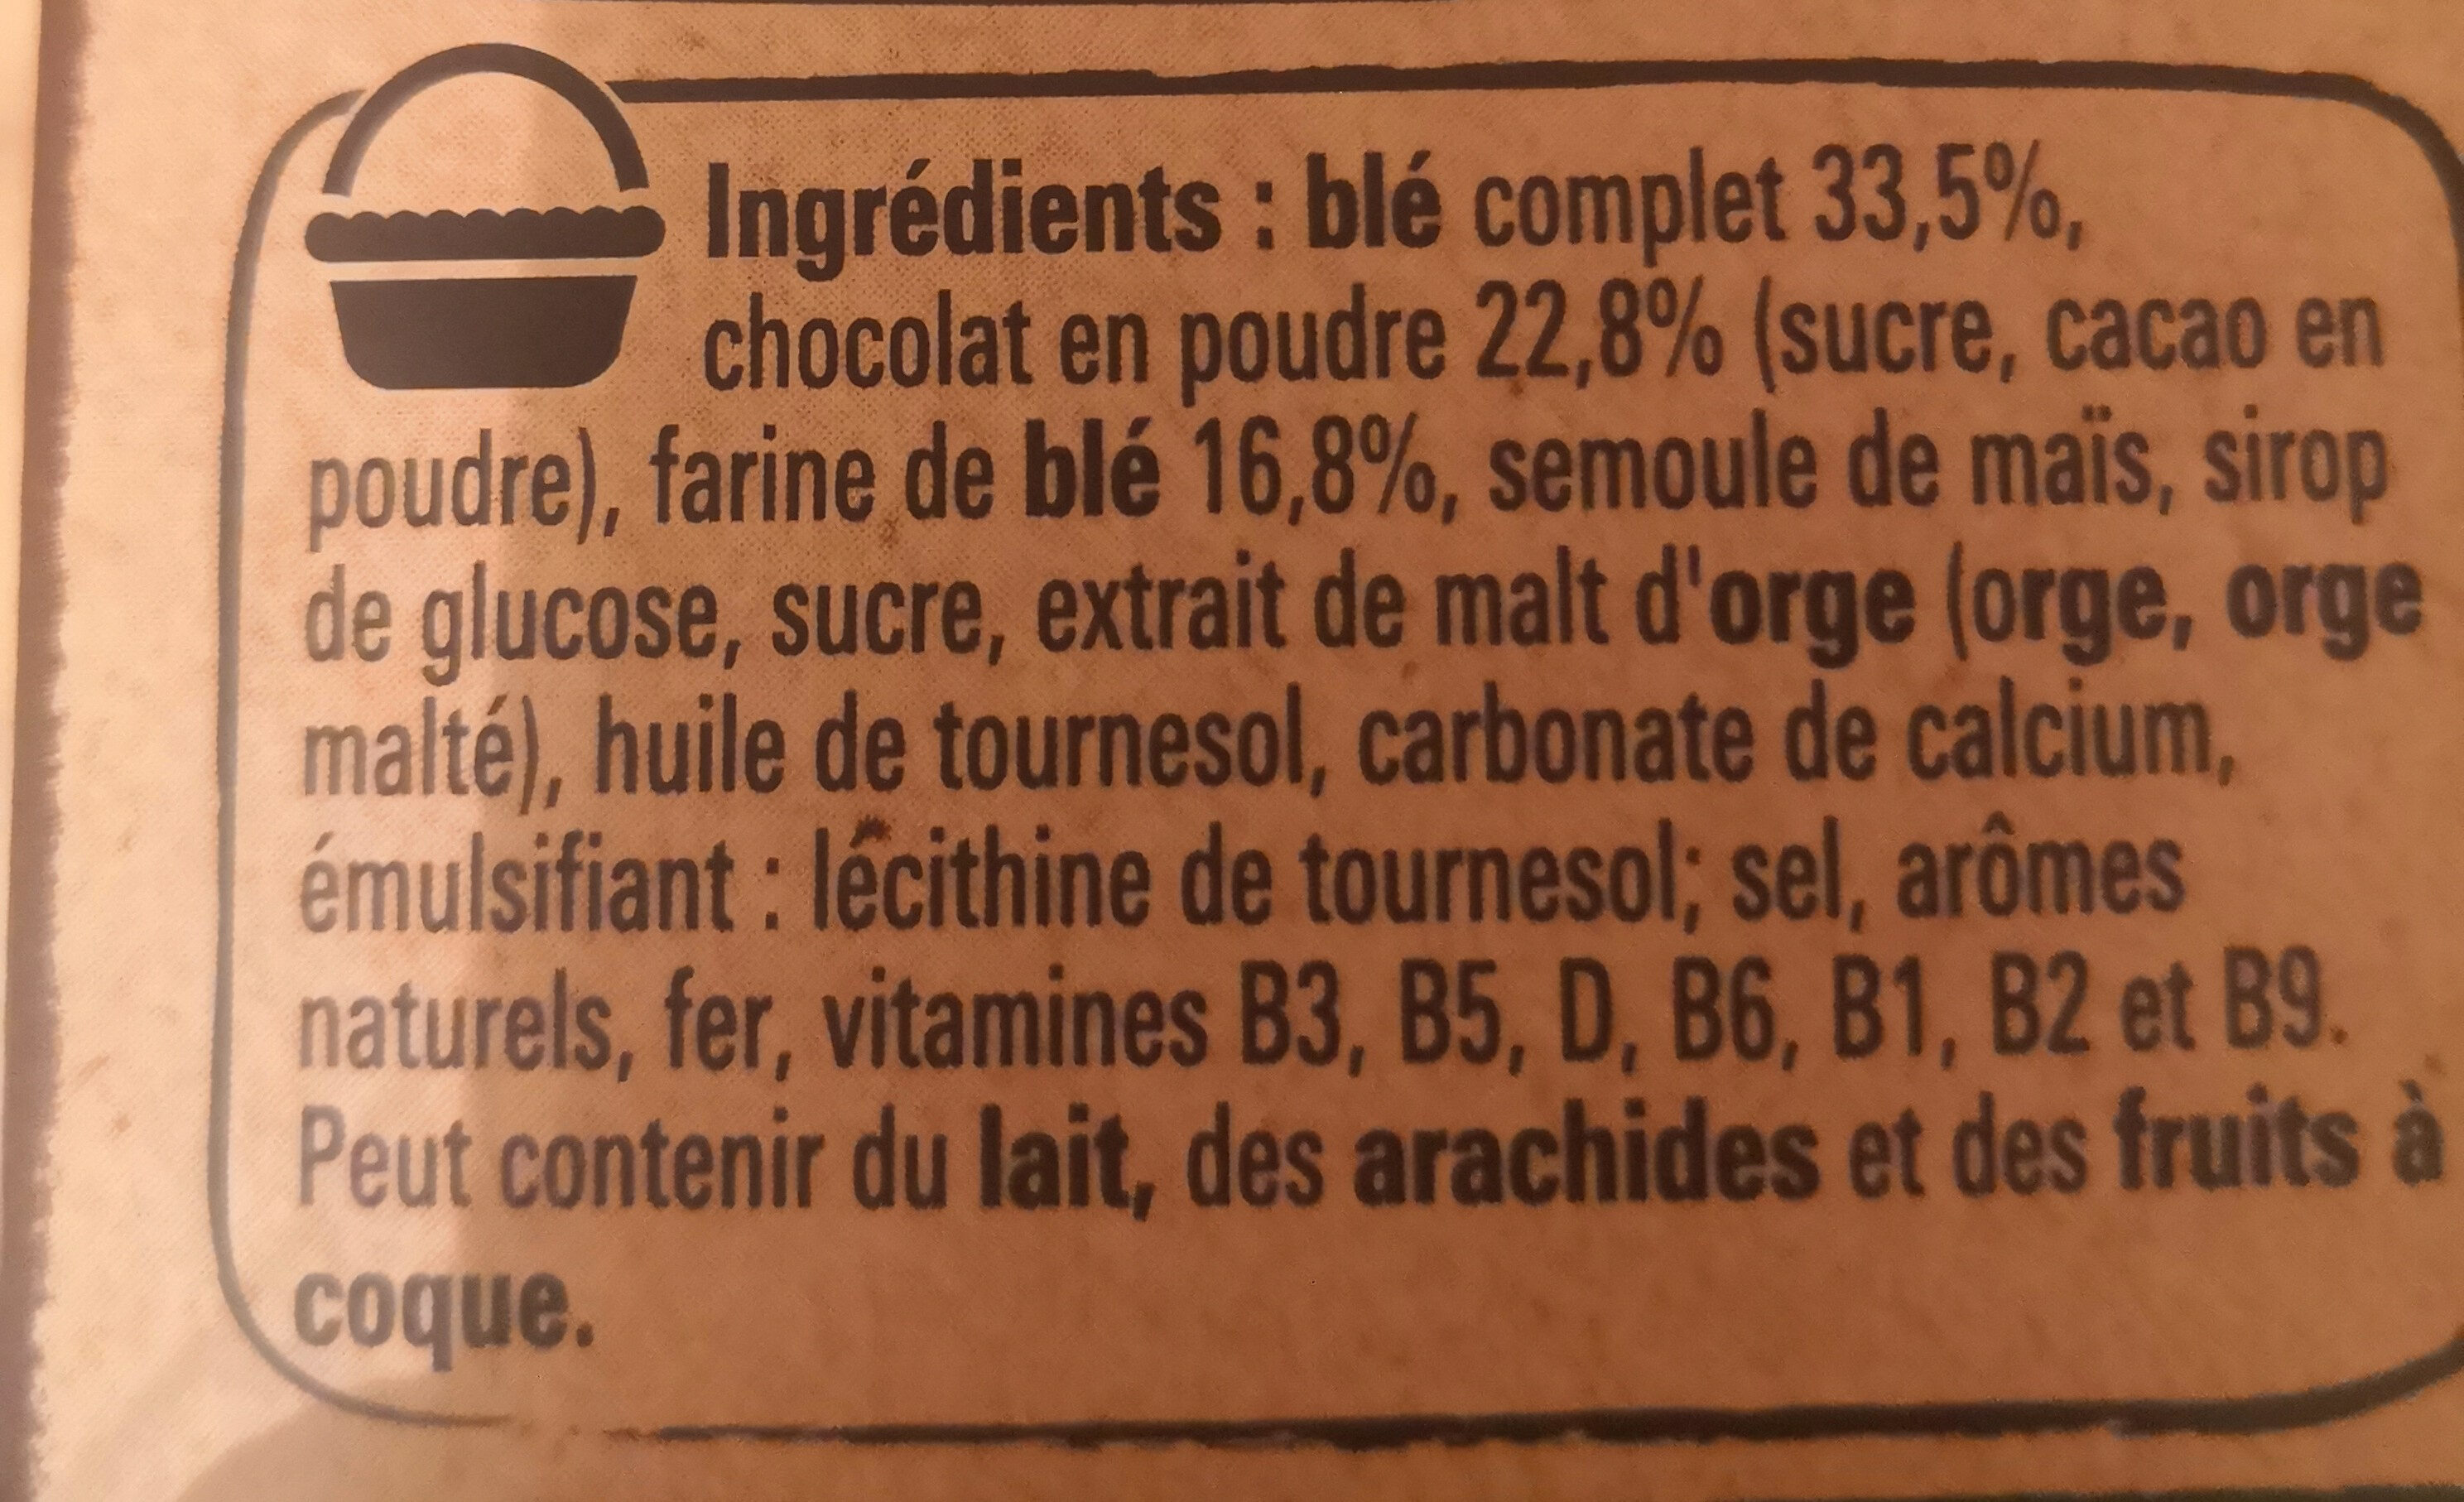 Chocapic - Ingredients - fr